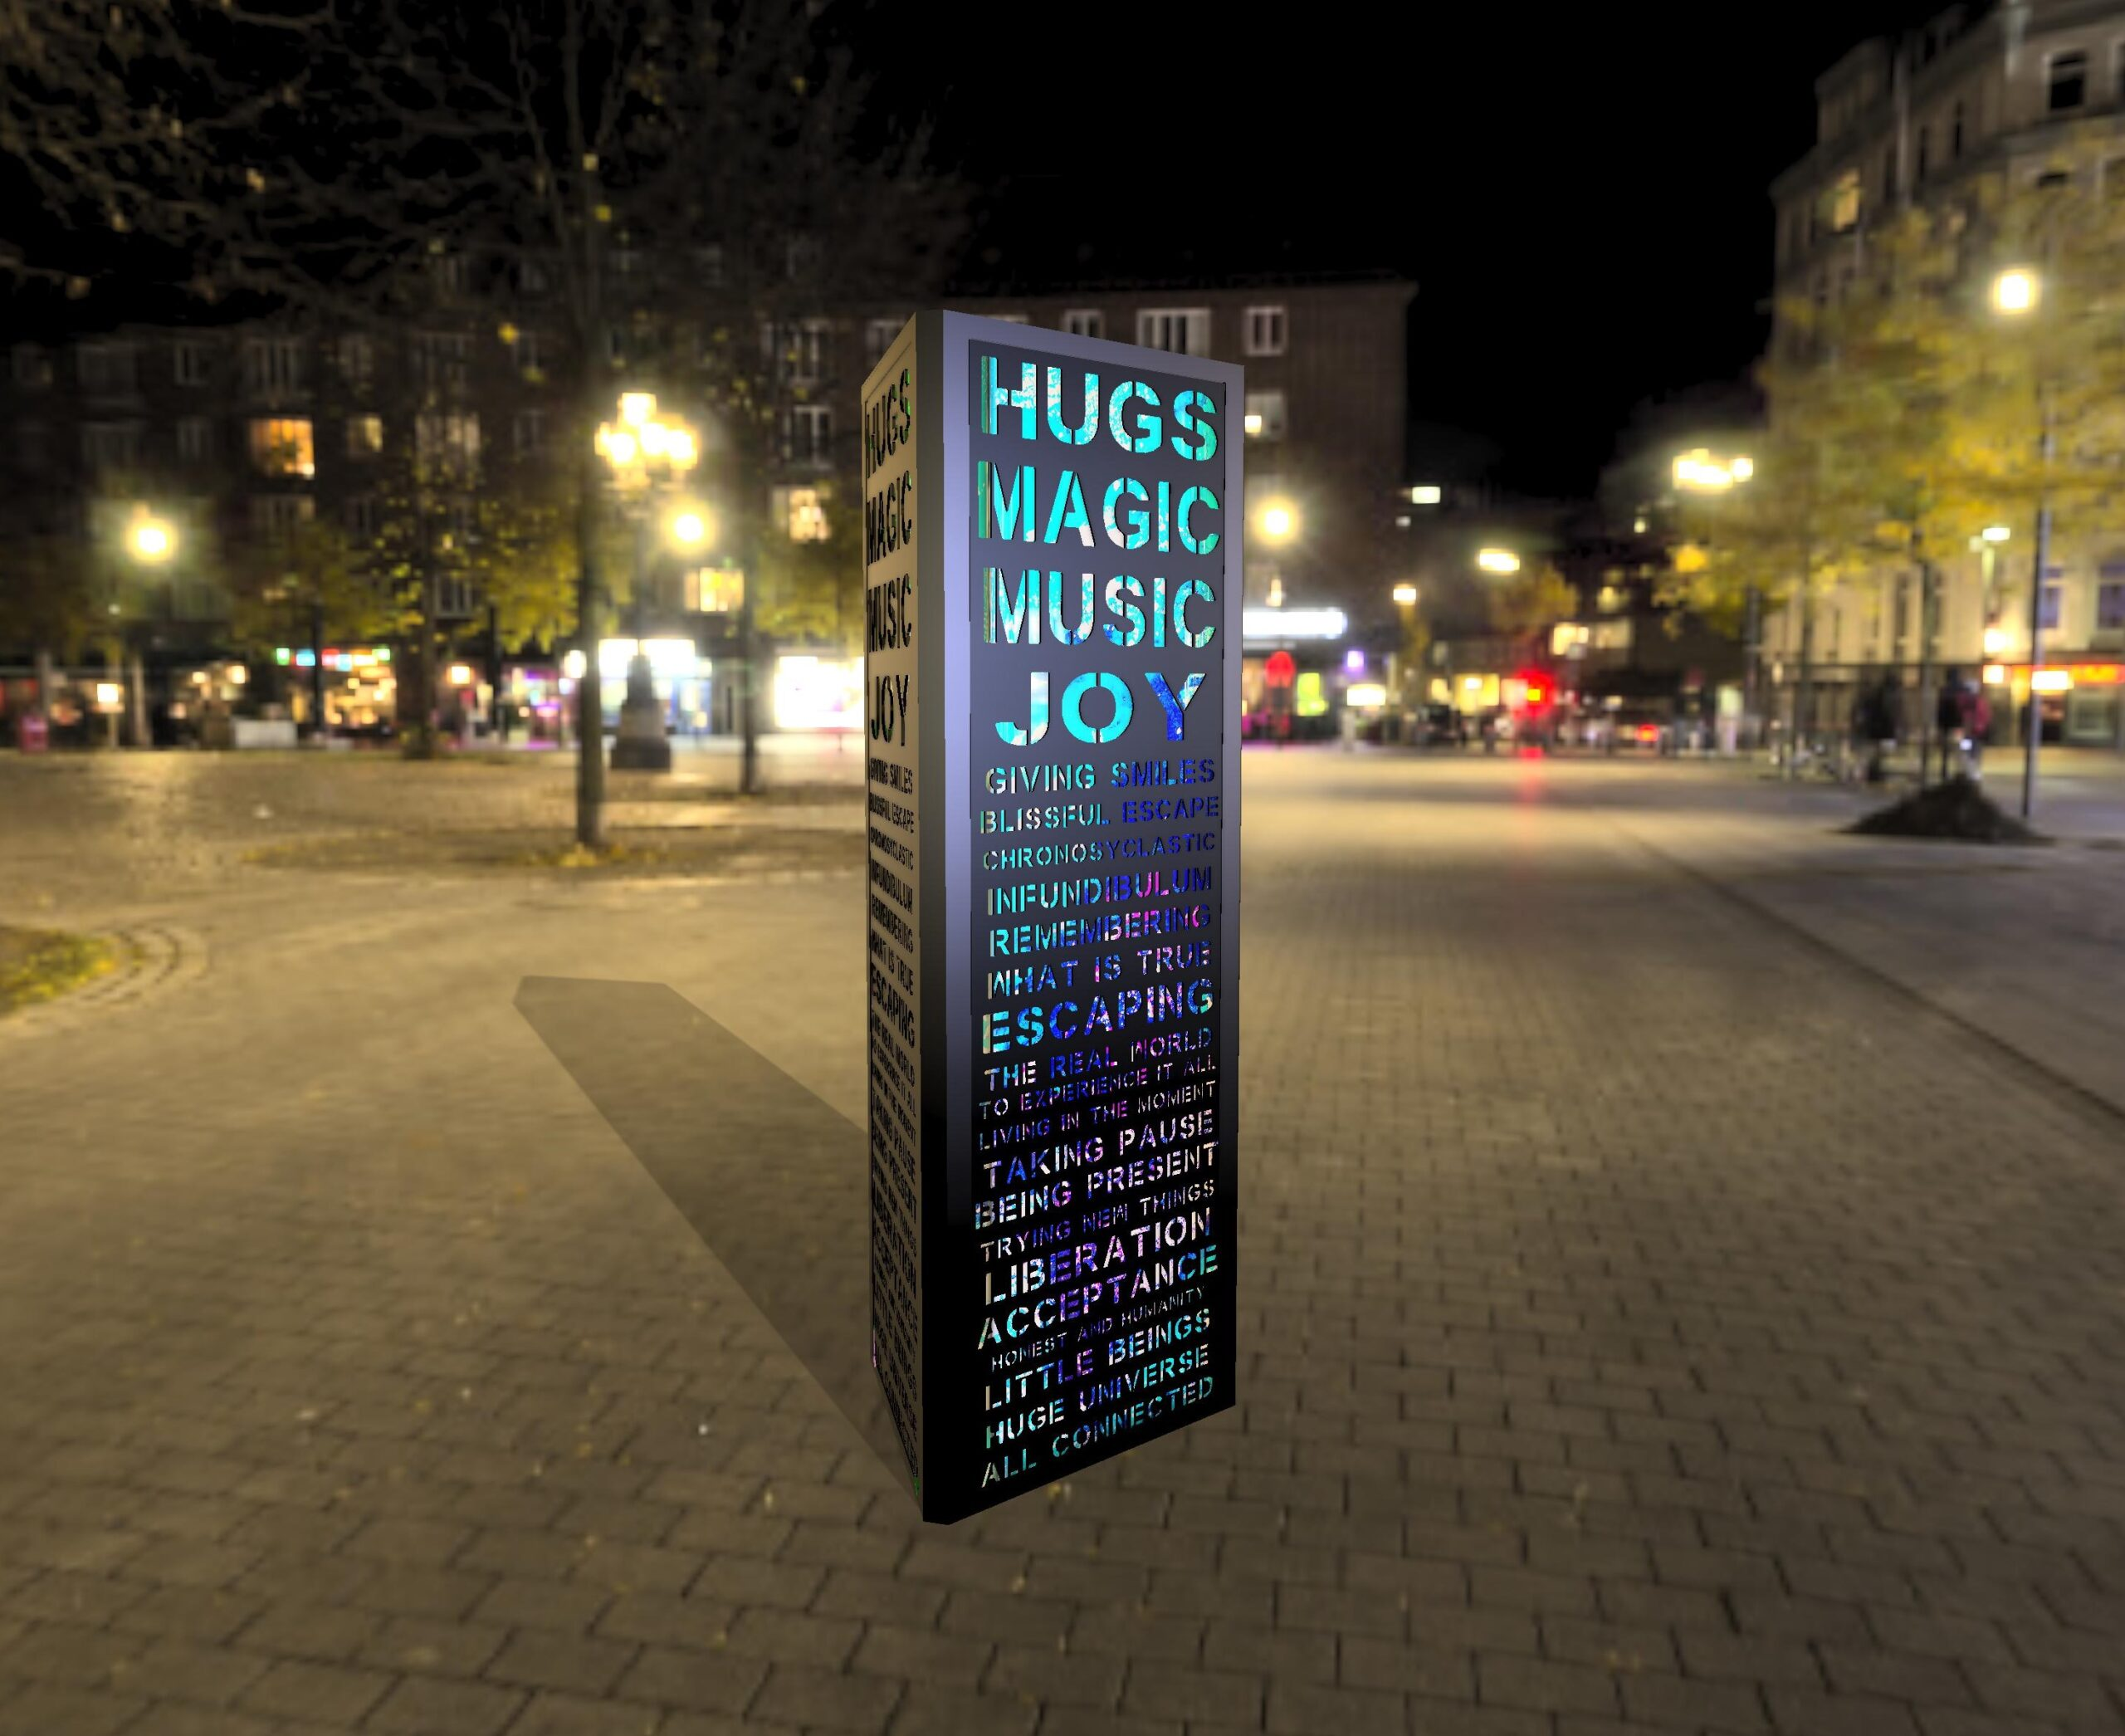 https://orloskystudio.com/wp-content/uploads/2021/10/POP-Light-Box-Prism-Pillar-1-scaled.jpg